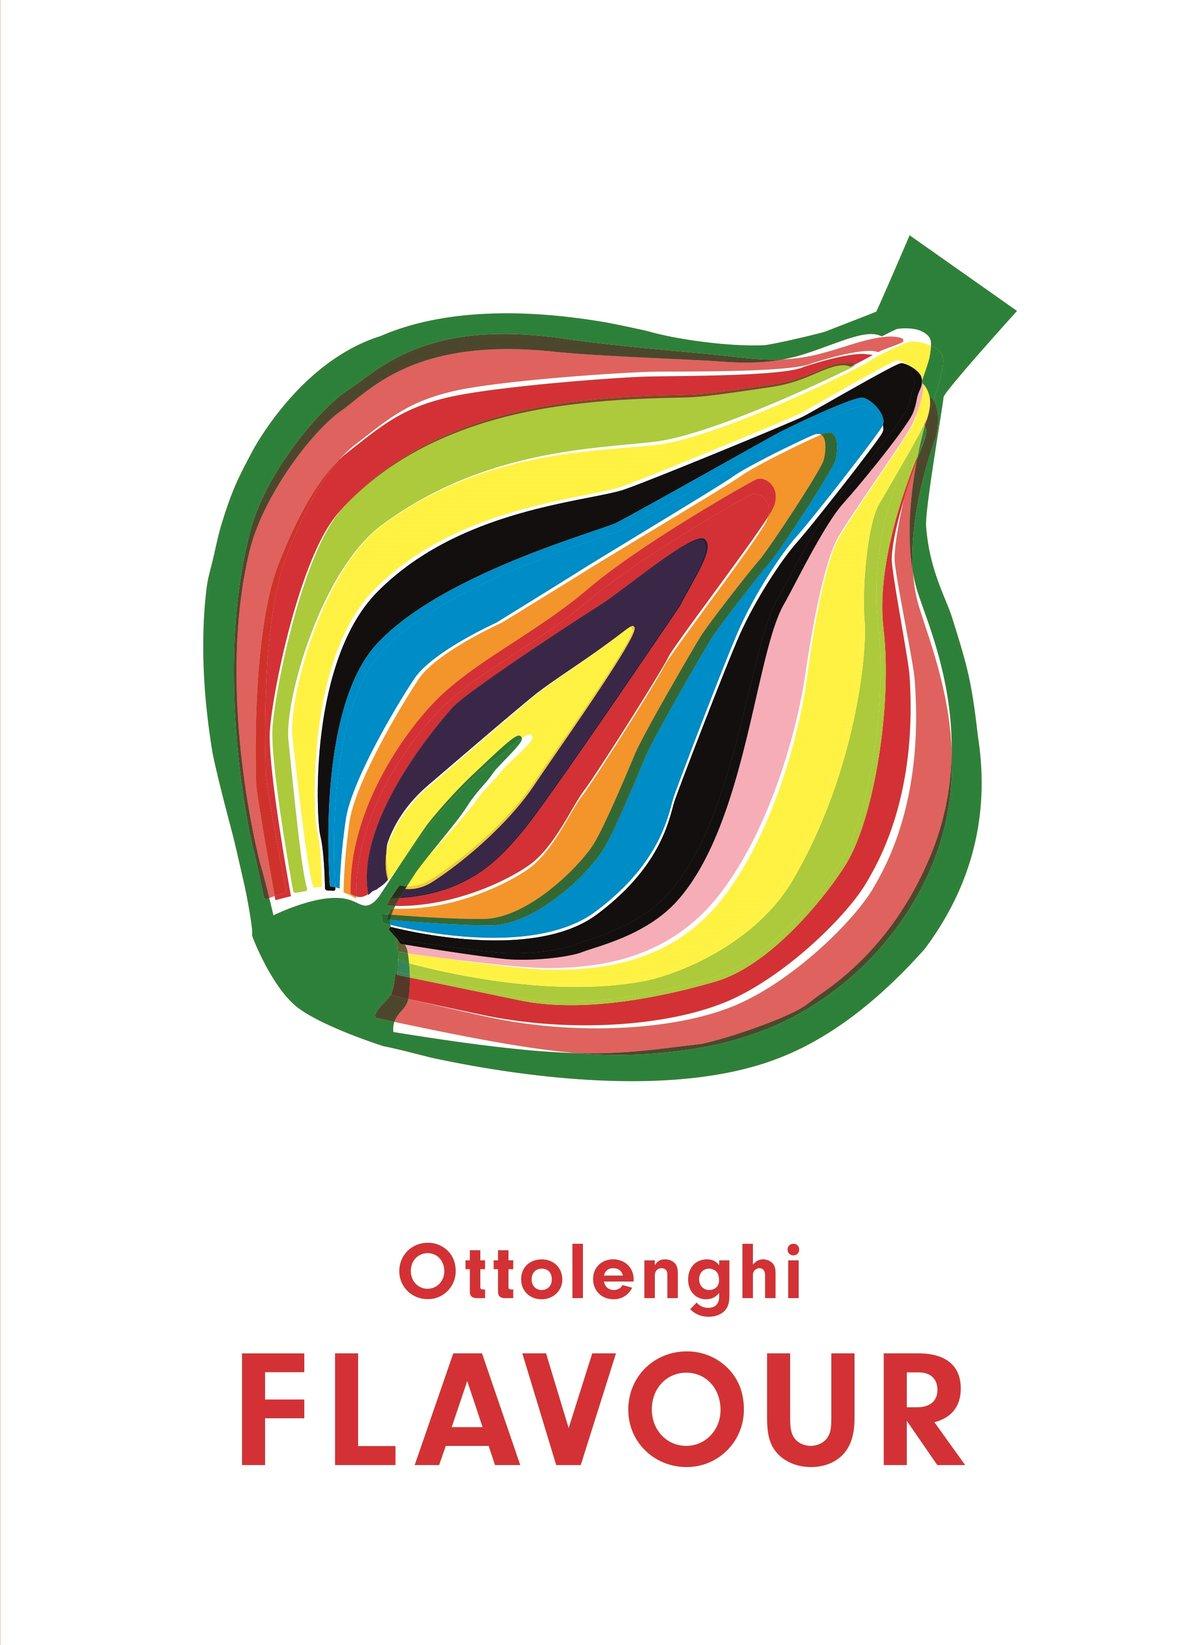 Ottolenghi - Flavour- Yottam Ottolenghi and Ixta Belfrage